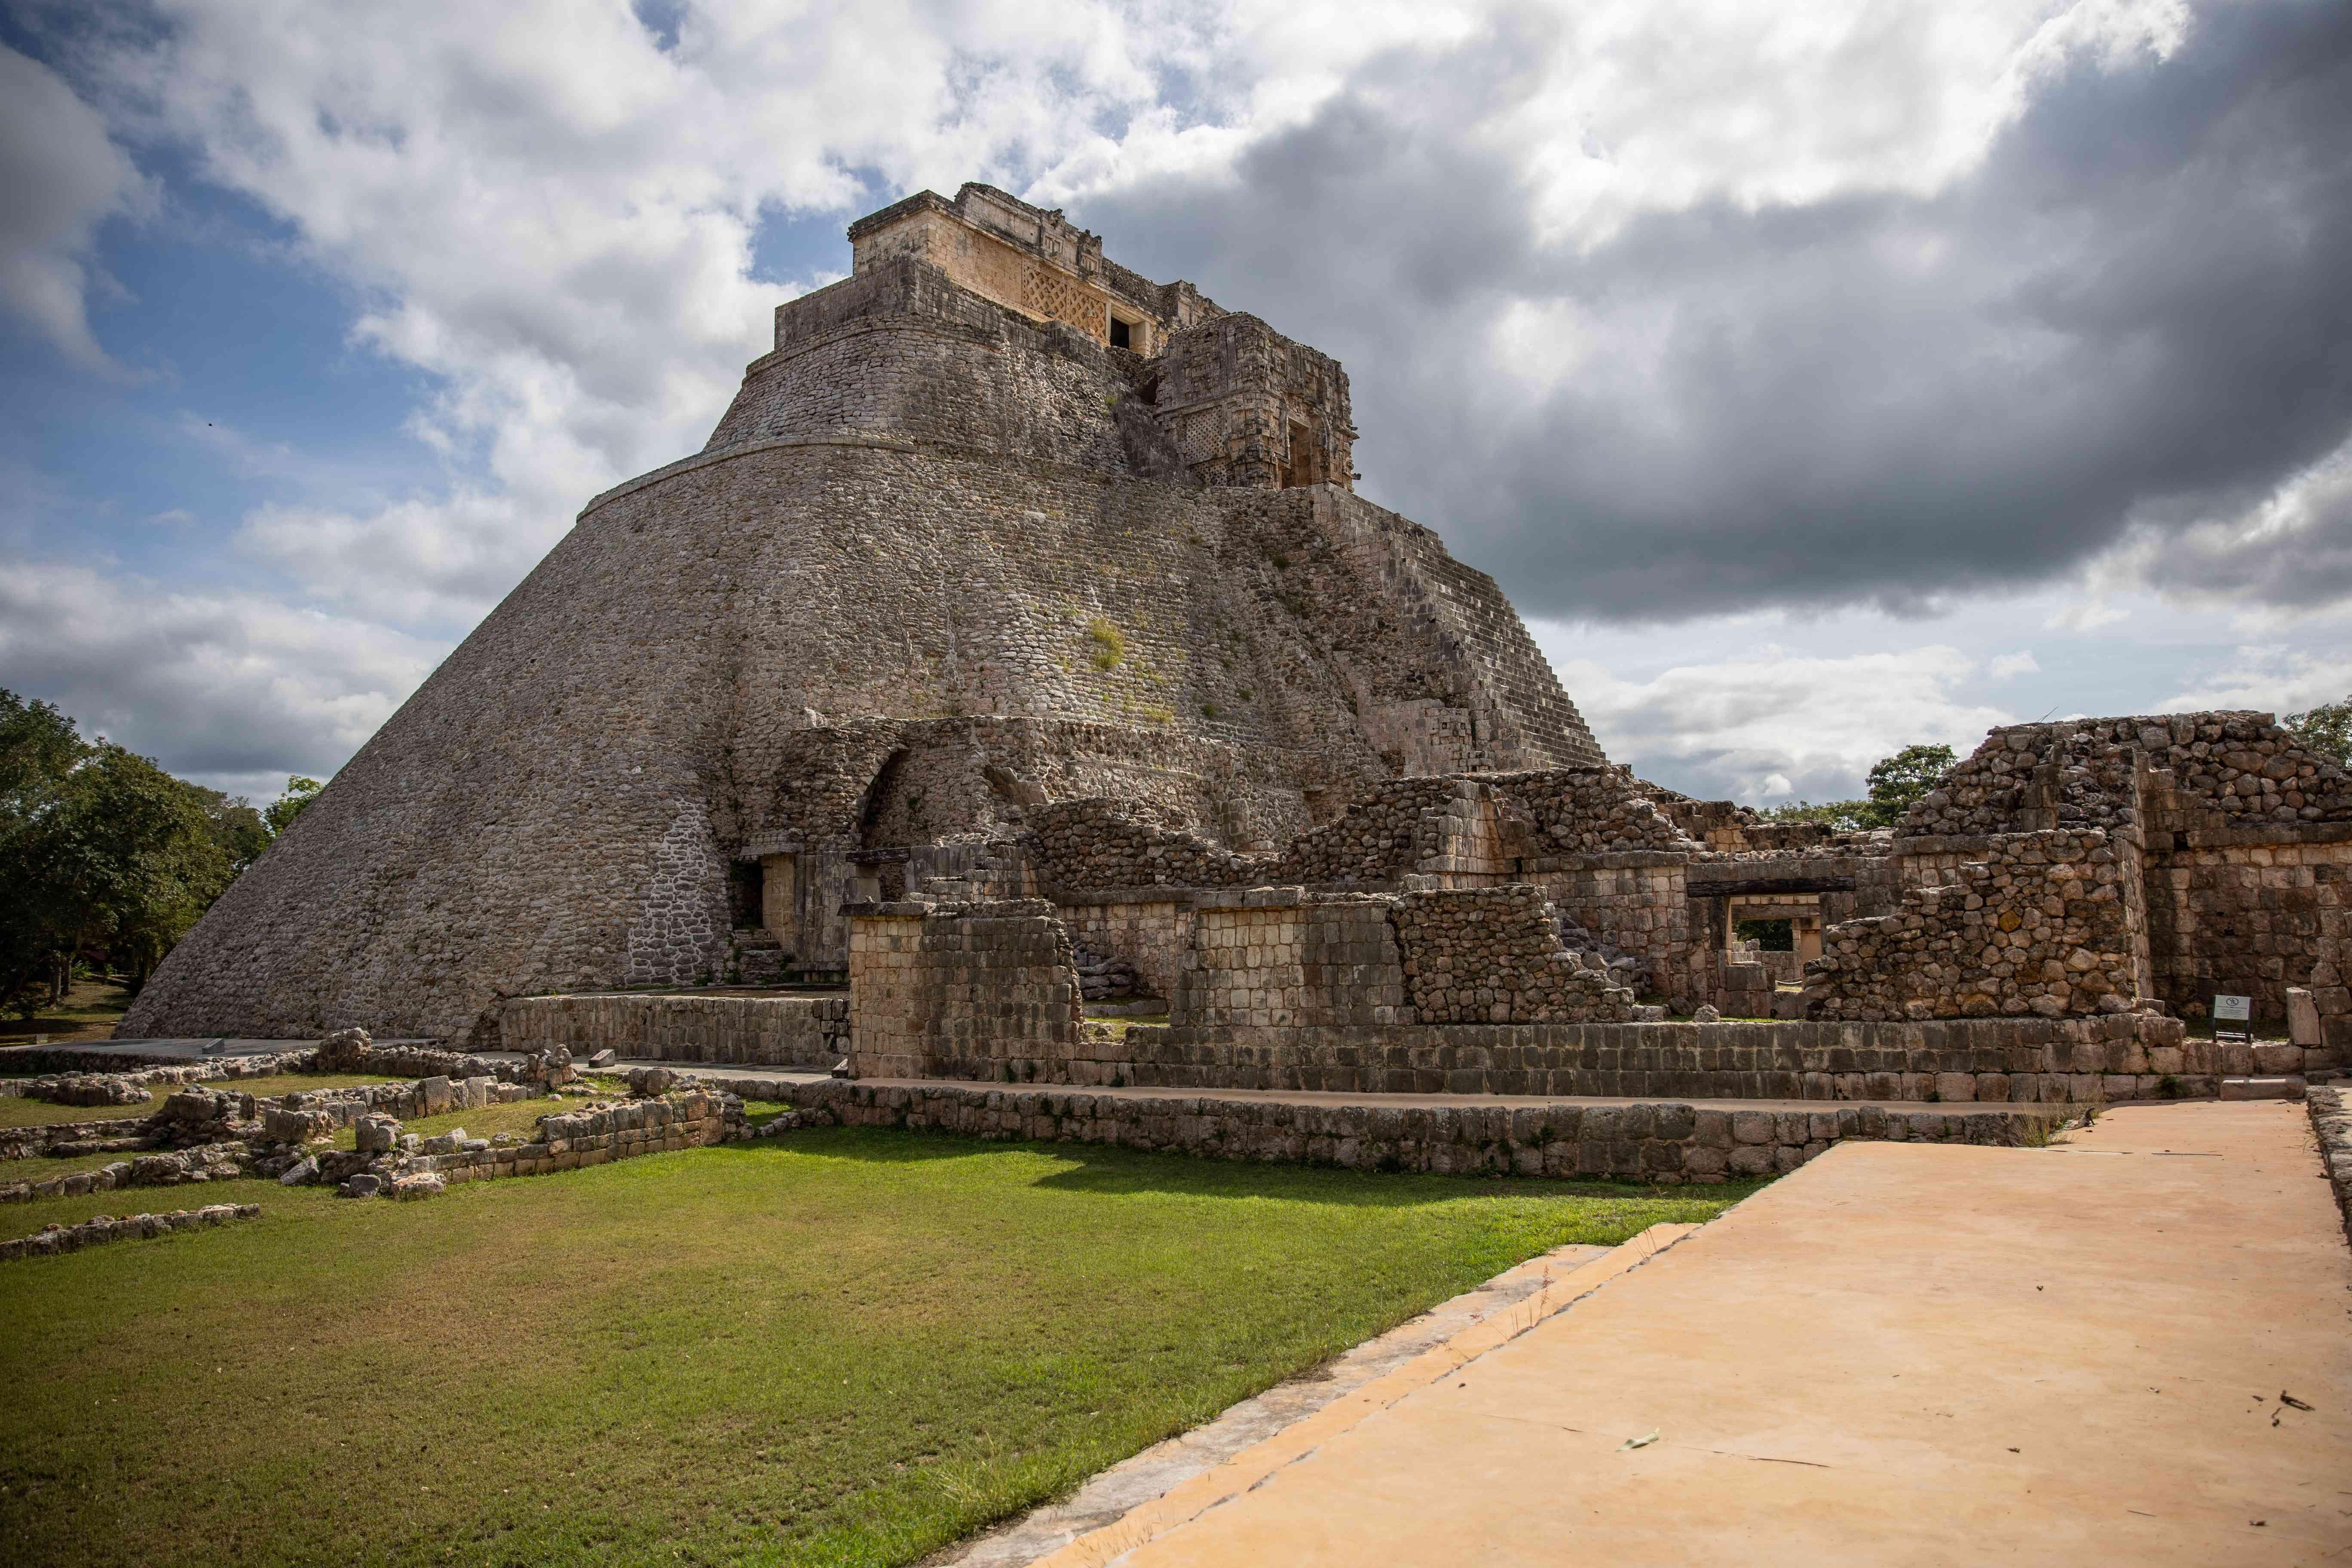 Uxmal Archeological Site